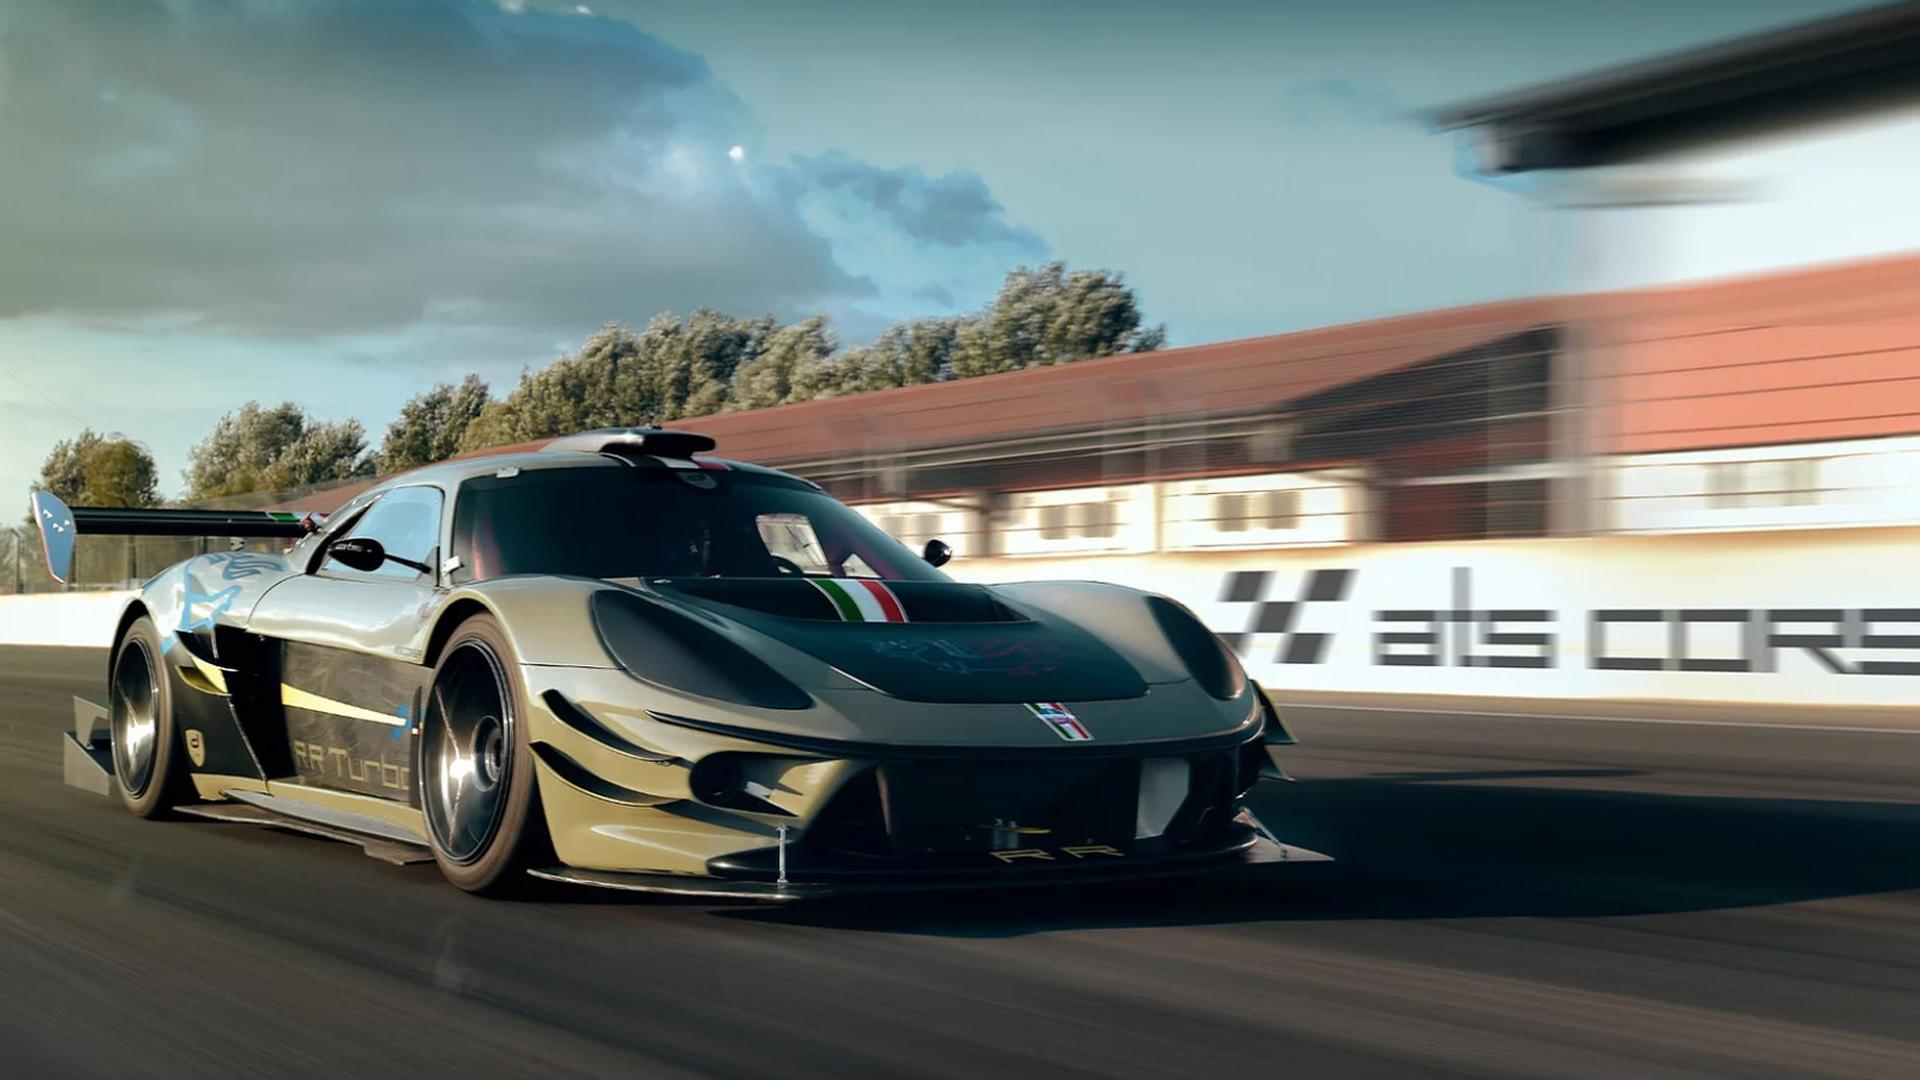 ATS RR Turbo race car